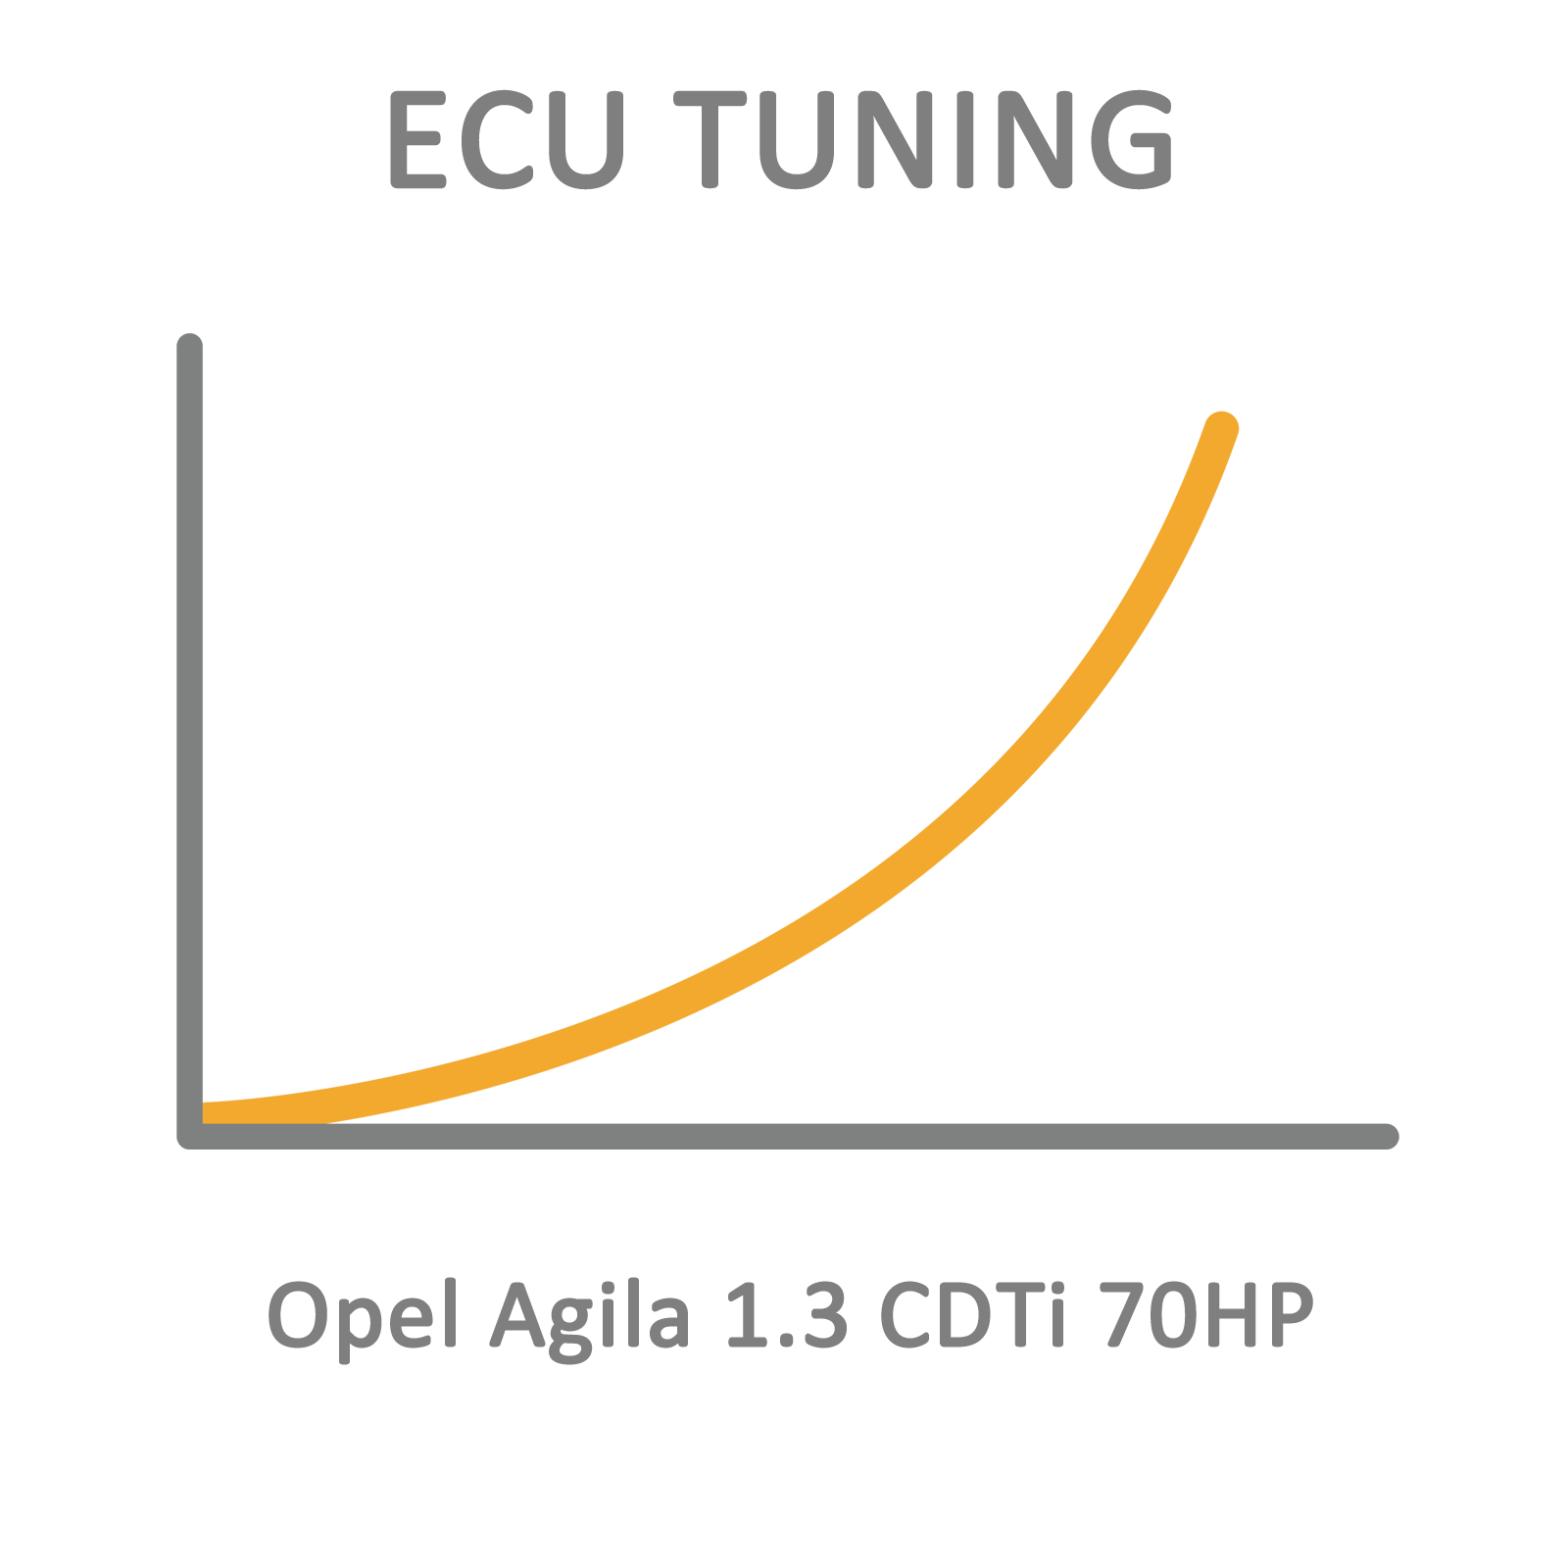 Opel Agila 1.3 CDTi 70HP ECU Tuning Remapping Programming